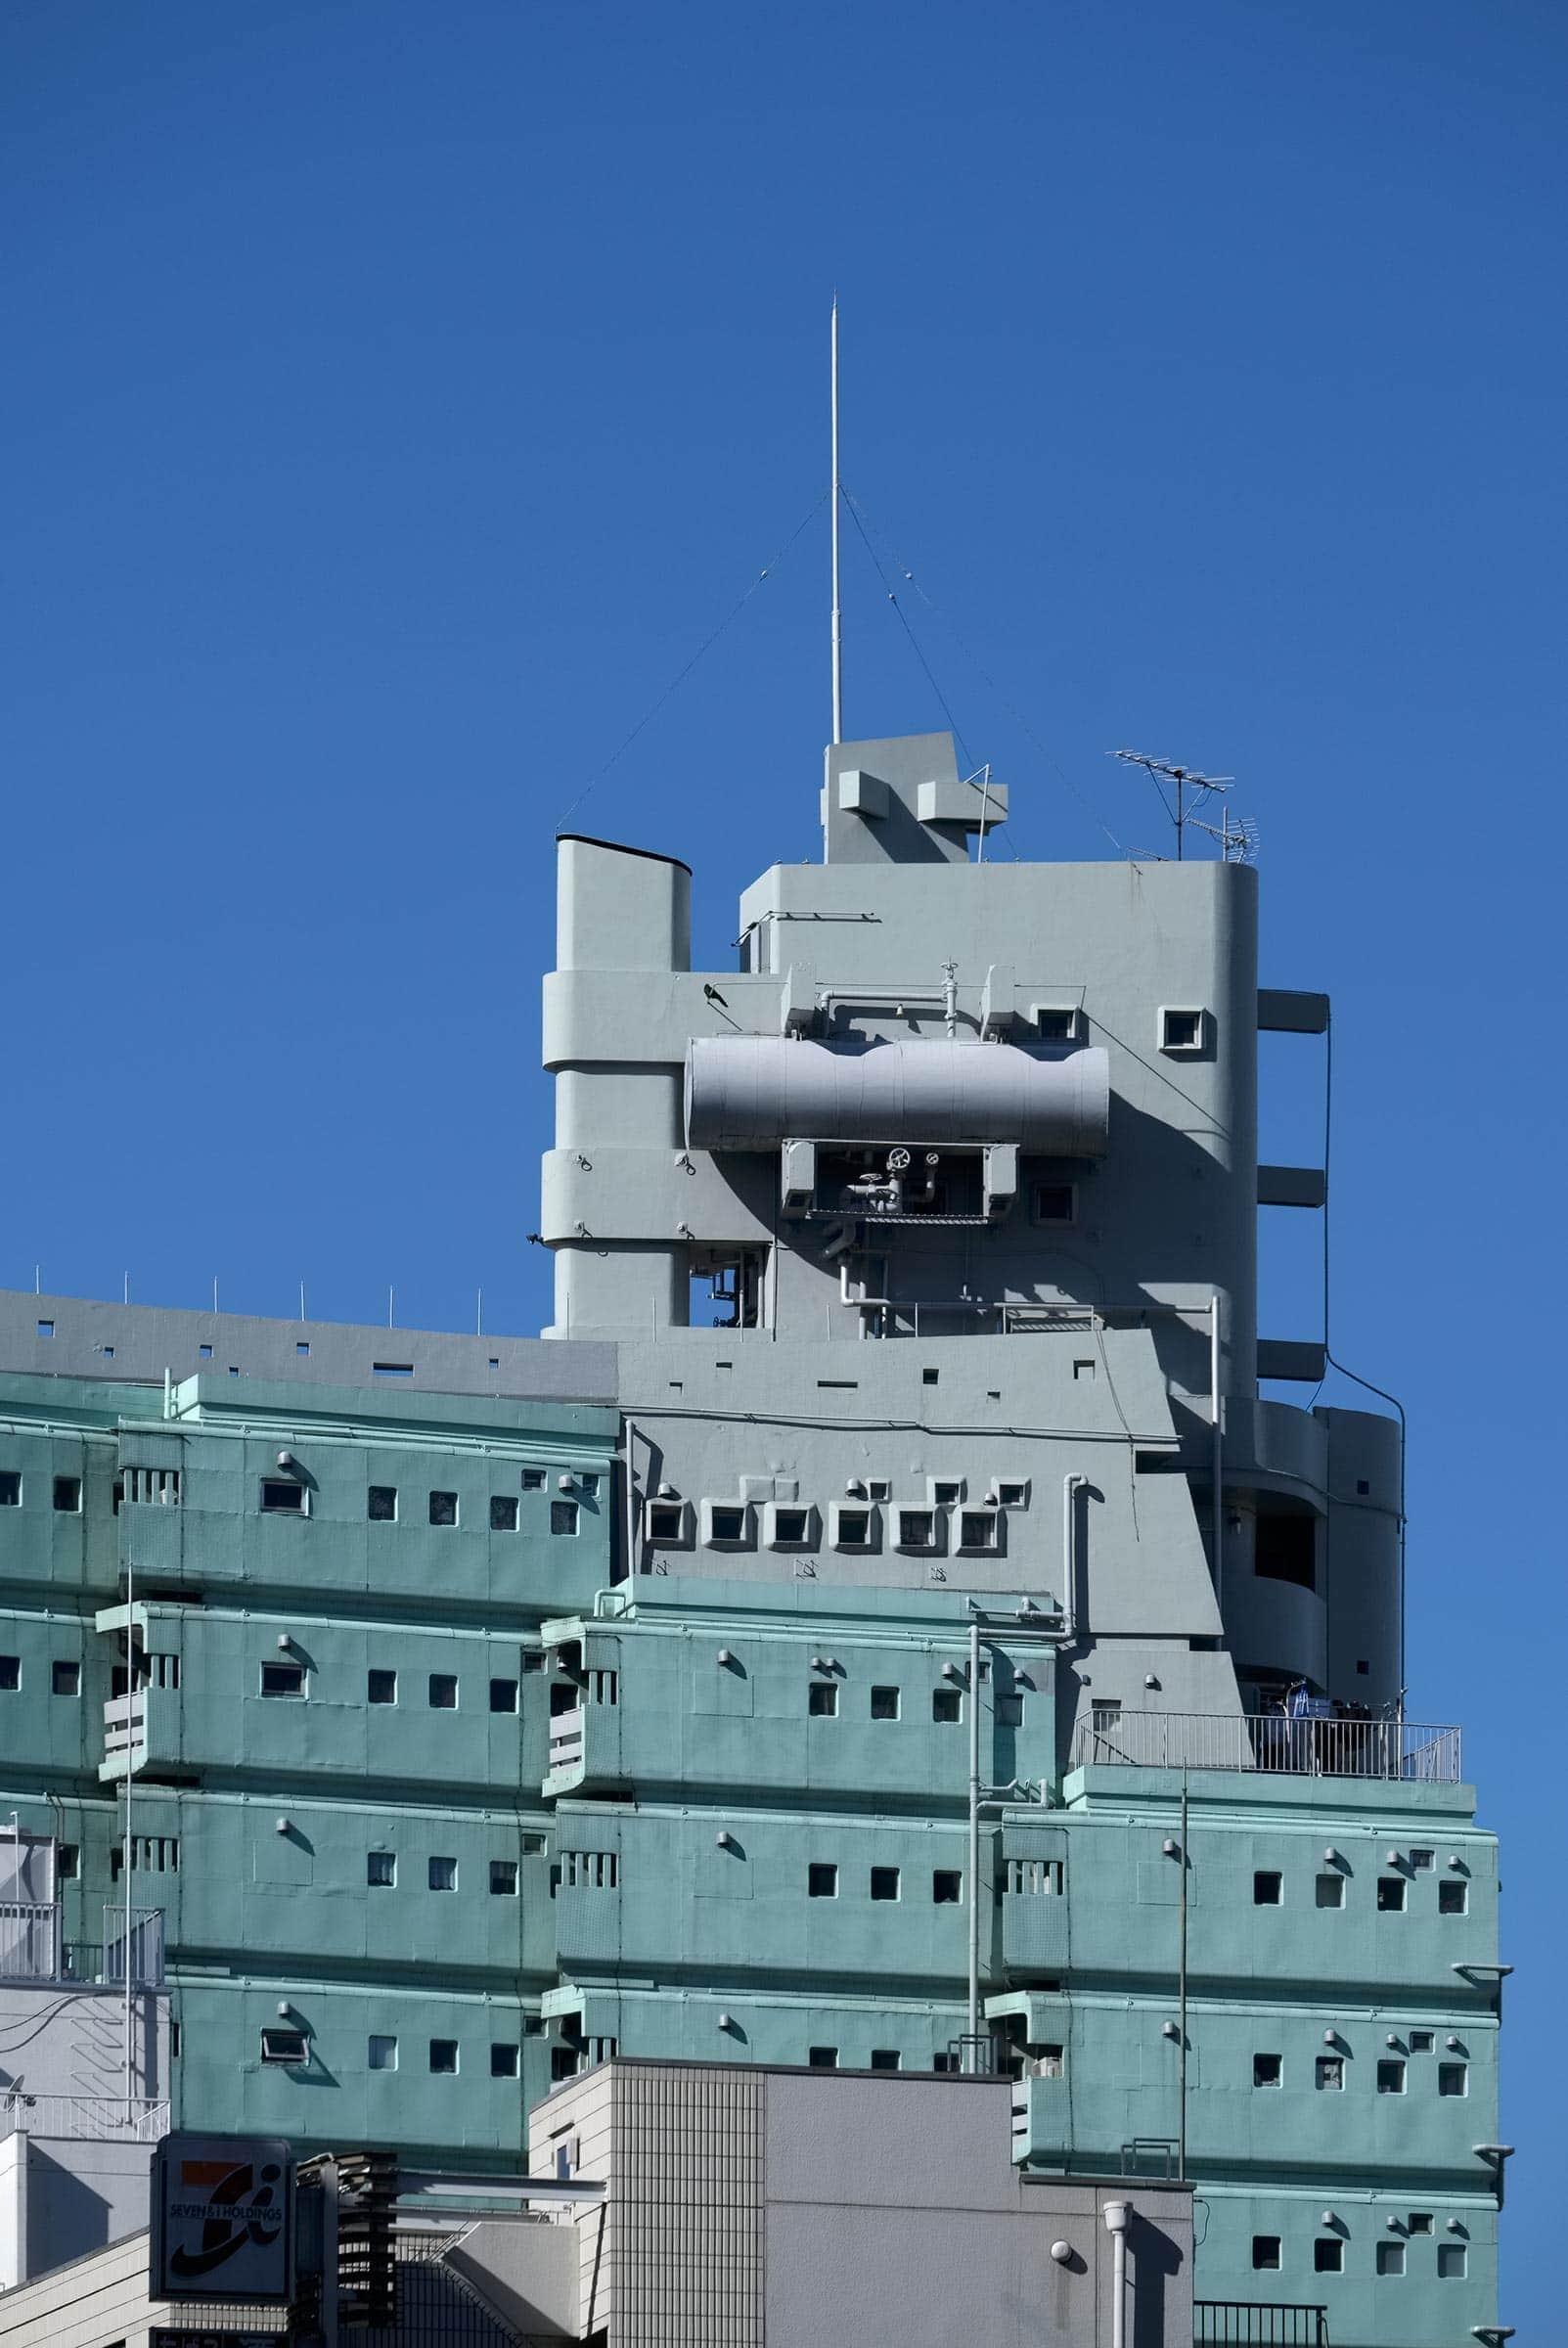 The Battleship Building